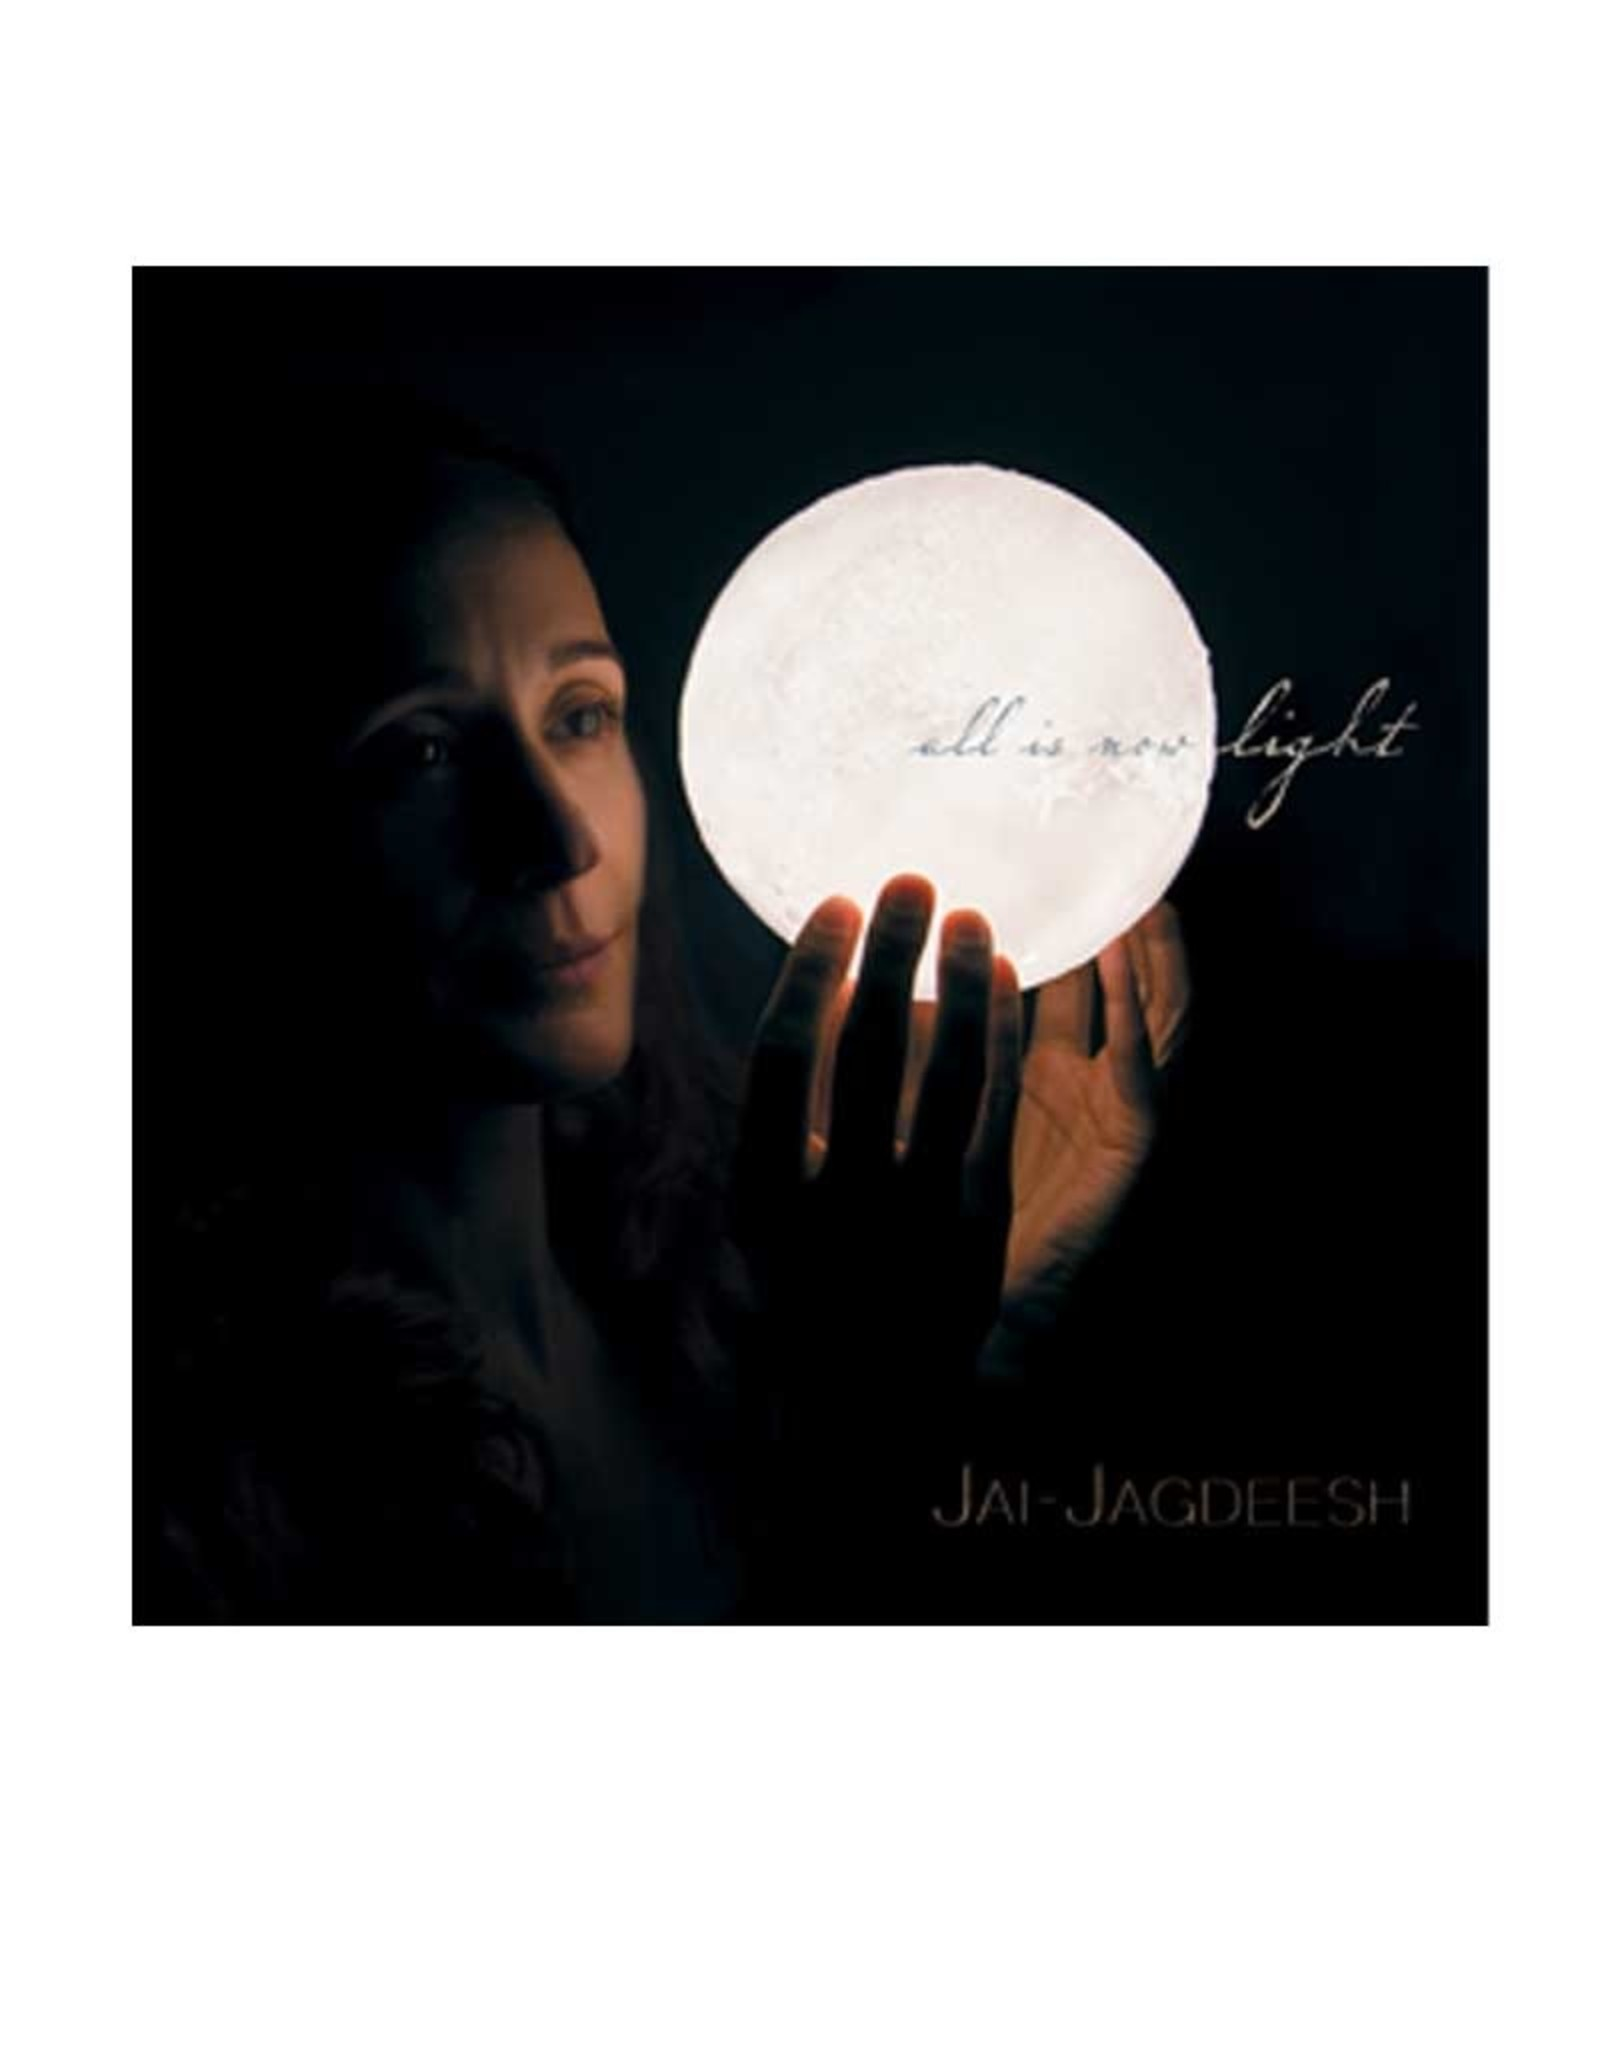 Jai-Jagdeesh All is Now Light CD by Jai-Jagdeesh